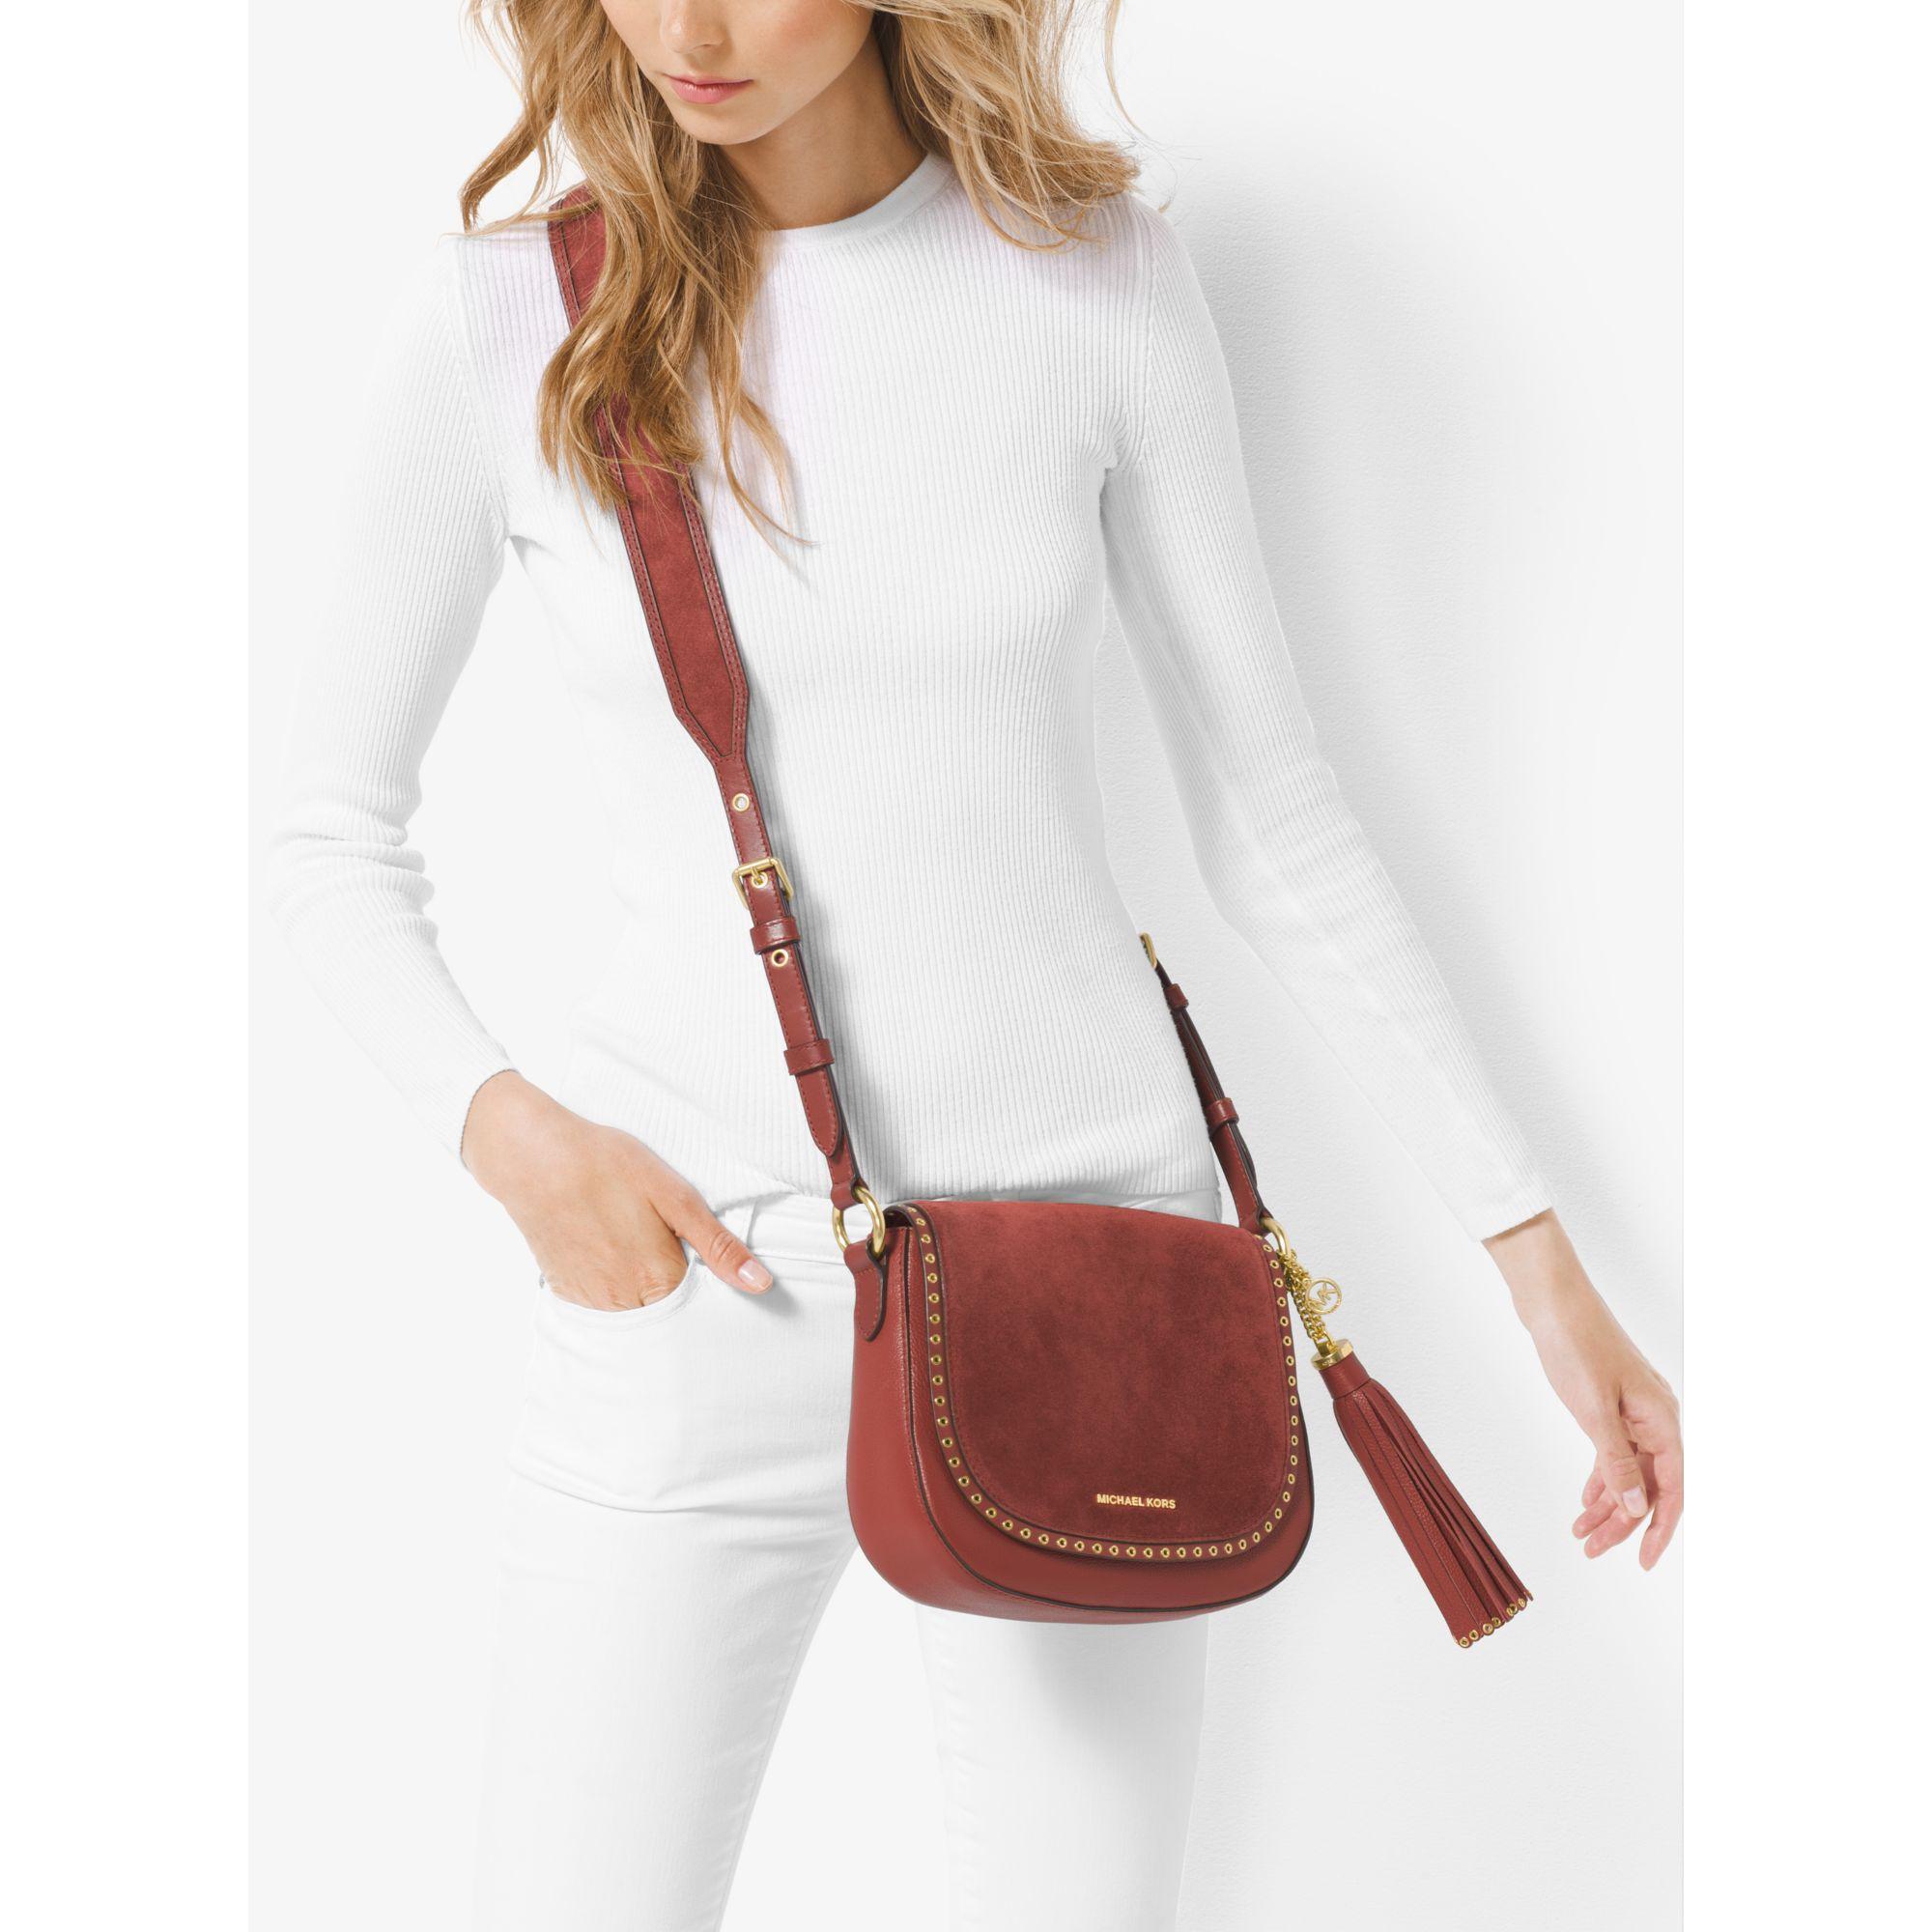 153dcc3ce14b Lyst - Michael Kors Brooklyn Medium Saddle Bag in Red